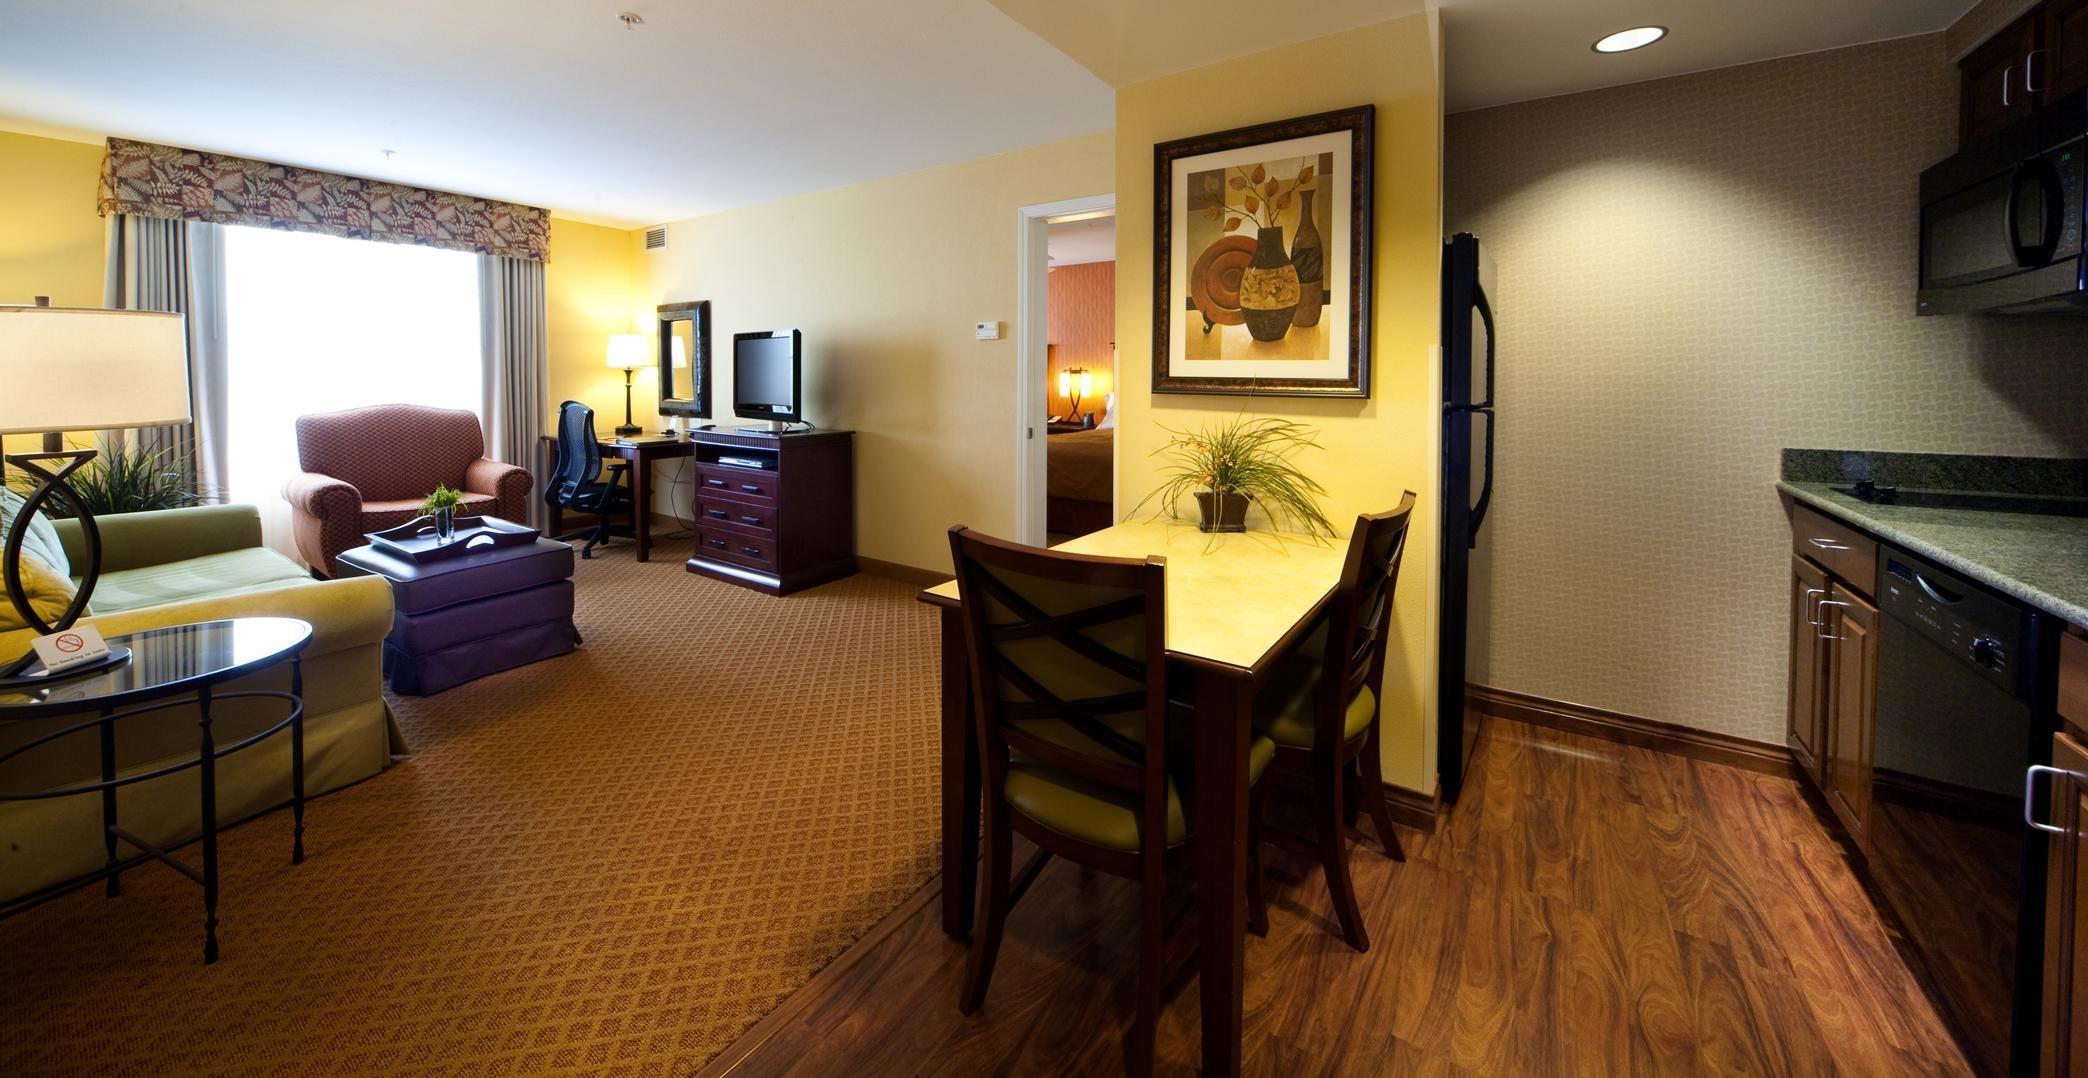 Homewood Suites by Hilton Denver International Airport image 10